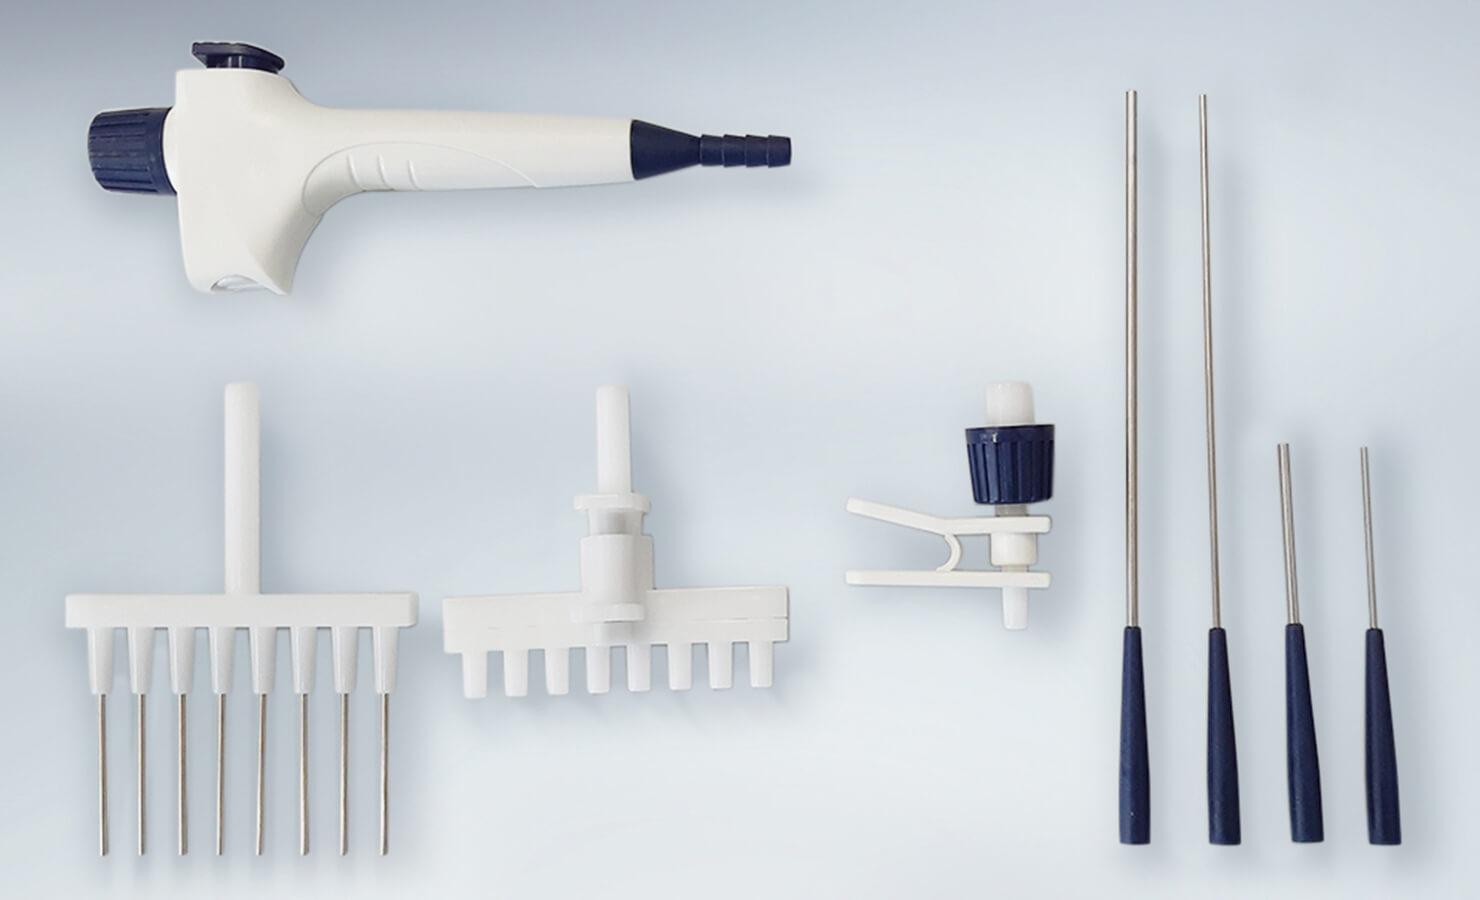 skan-labor-produkte-zubehoer-safevac-01